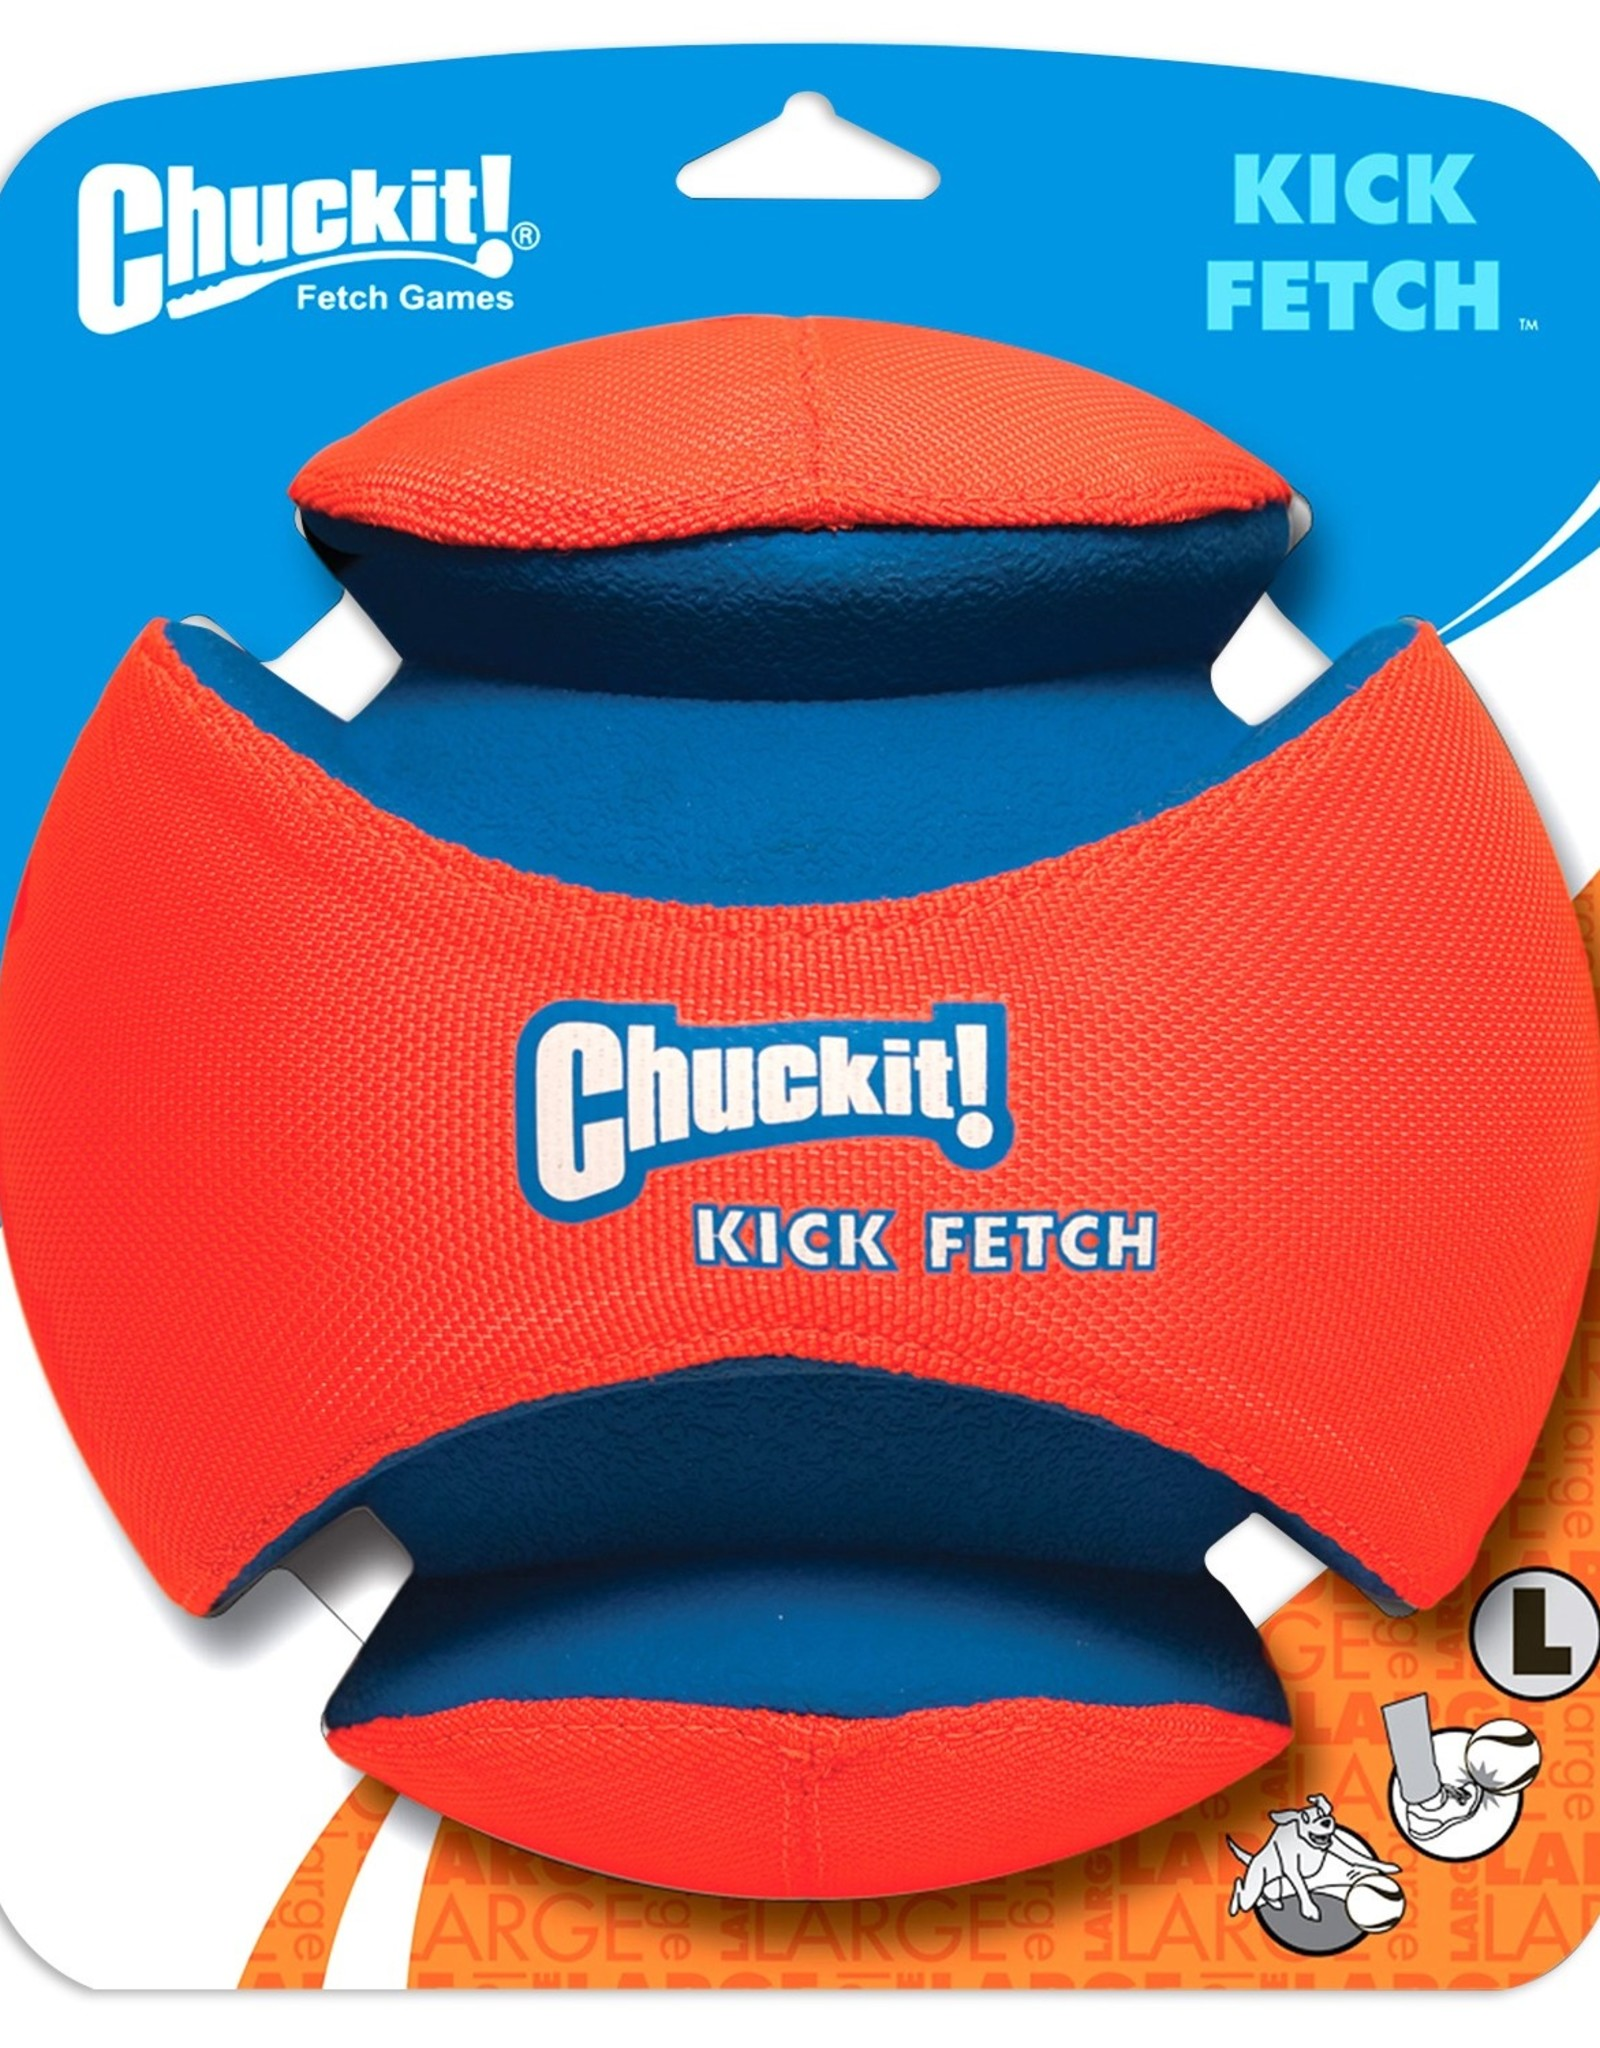 CHUCK IT! KICK FETCH LARGE